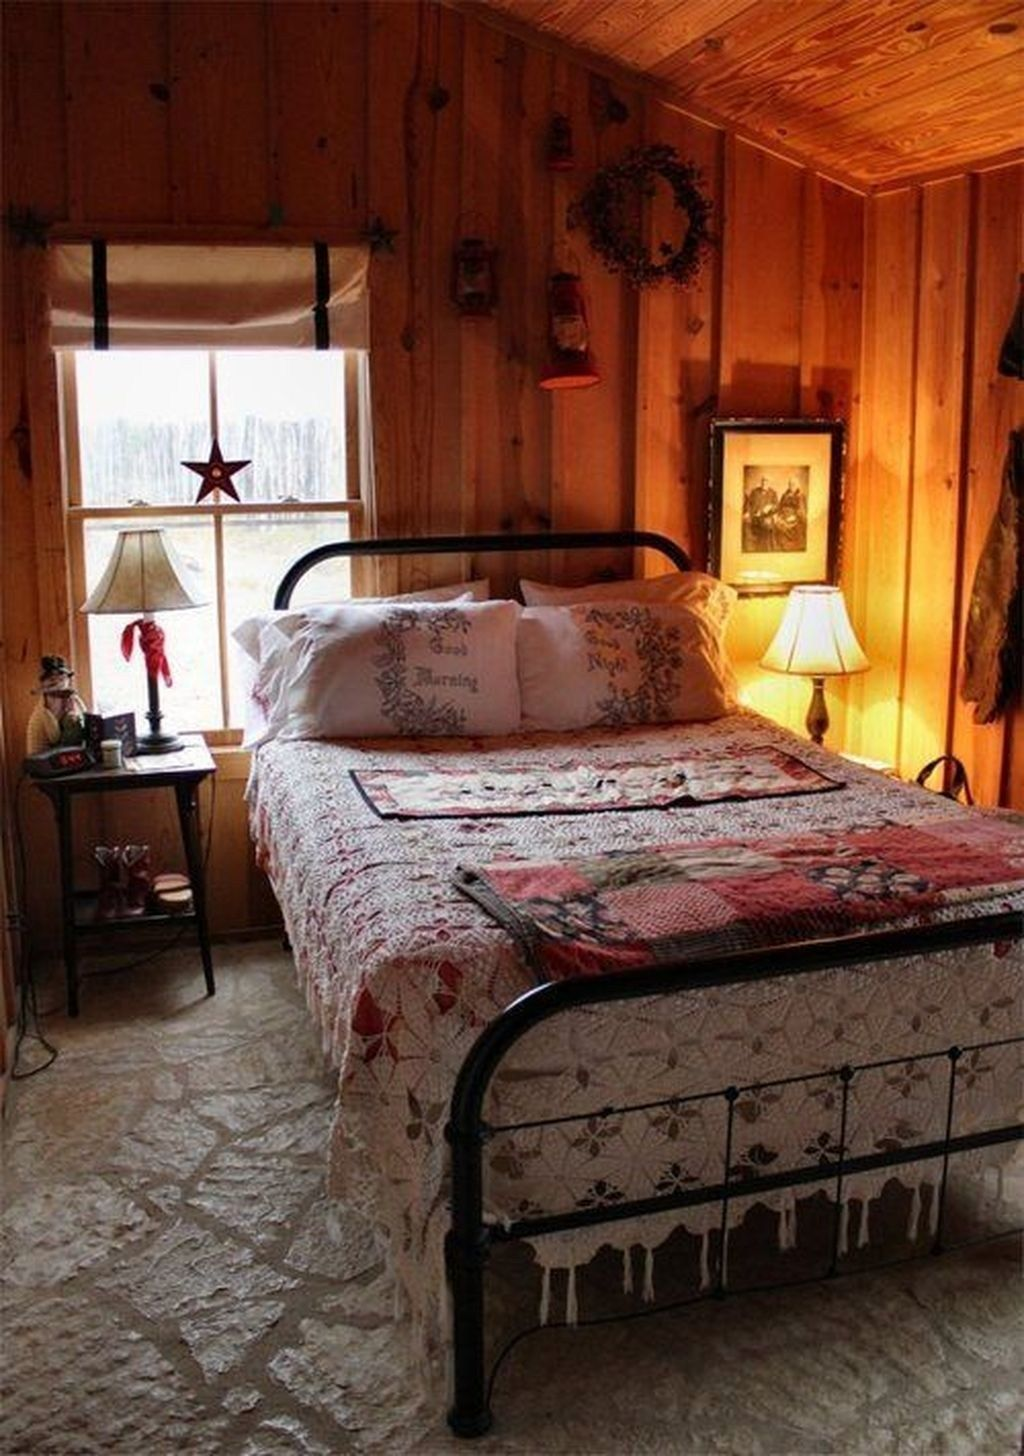 Fantastic Rustic Cabin Bedroom Decorating Ideas 20 Cabin Bedroom Decor Small Master Bedroom Cabin Interiors